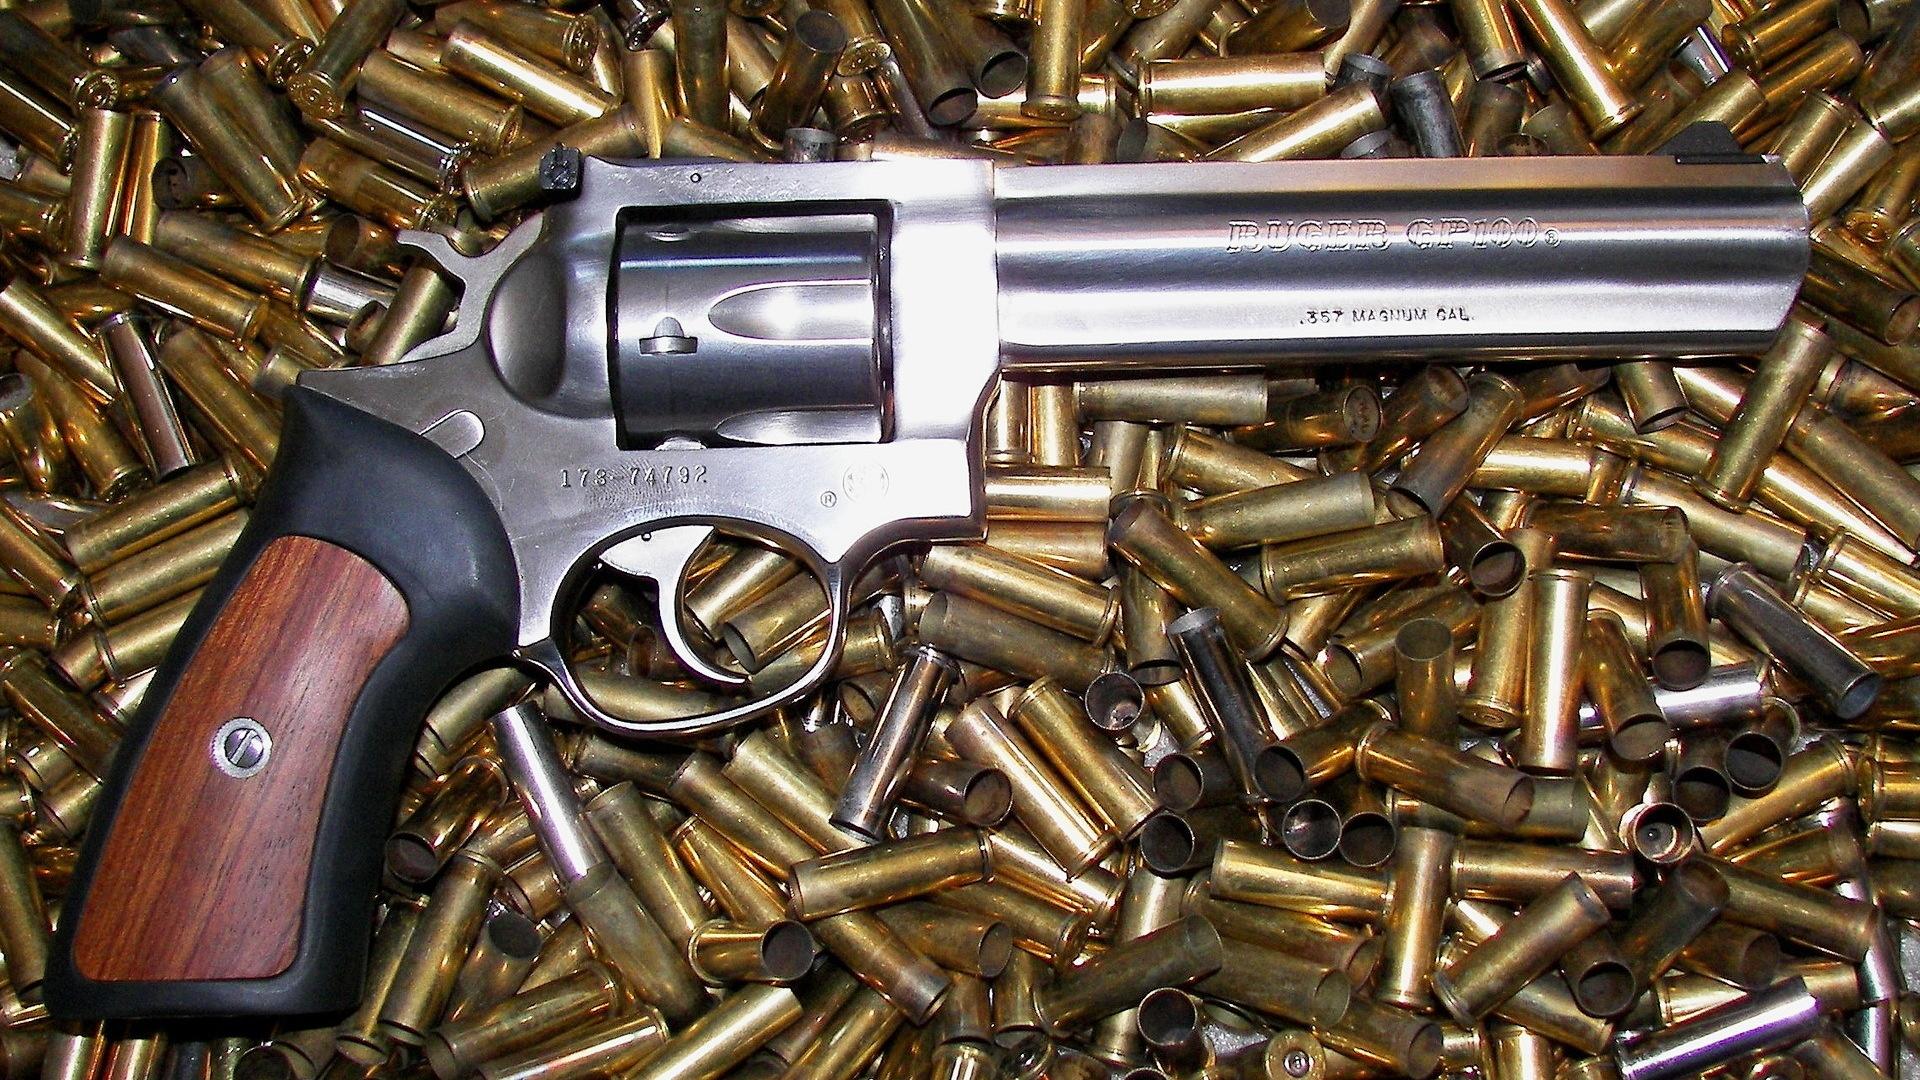 14 <b>Revolver</b> HD <b>Wallpapers</b> | <b>Backgrounds</b> - <b>Wallpaper</b> Abyss